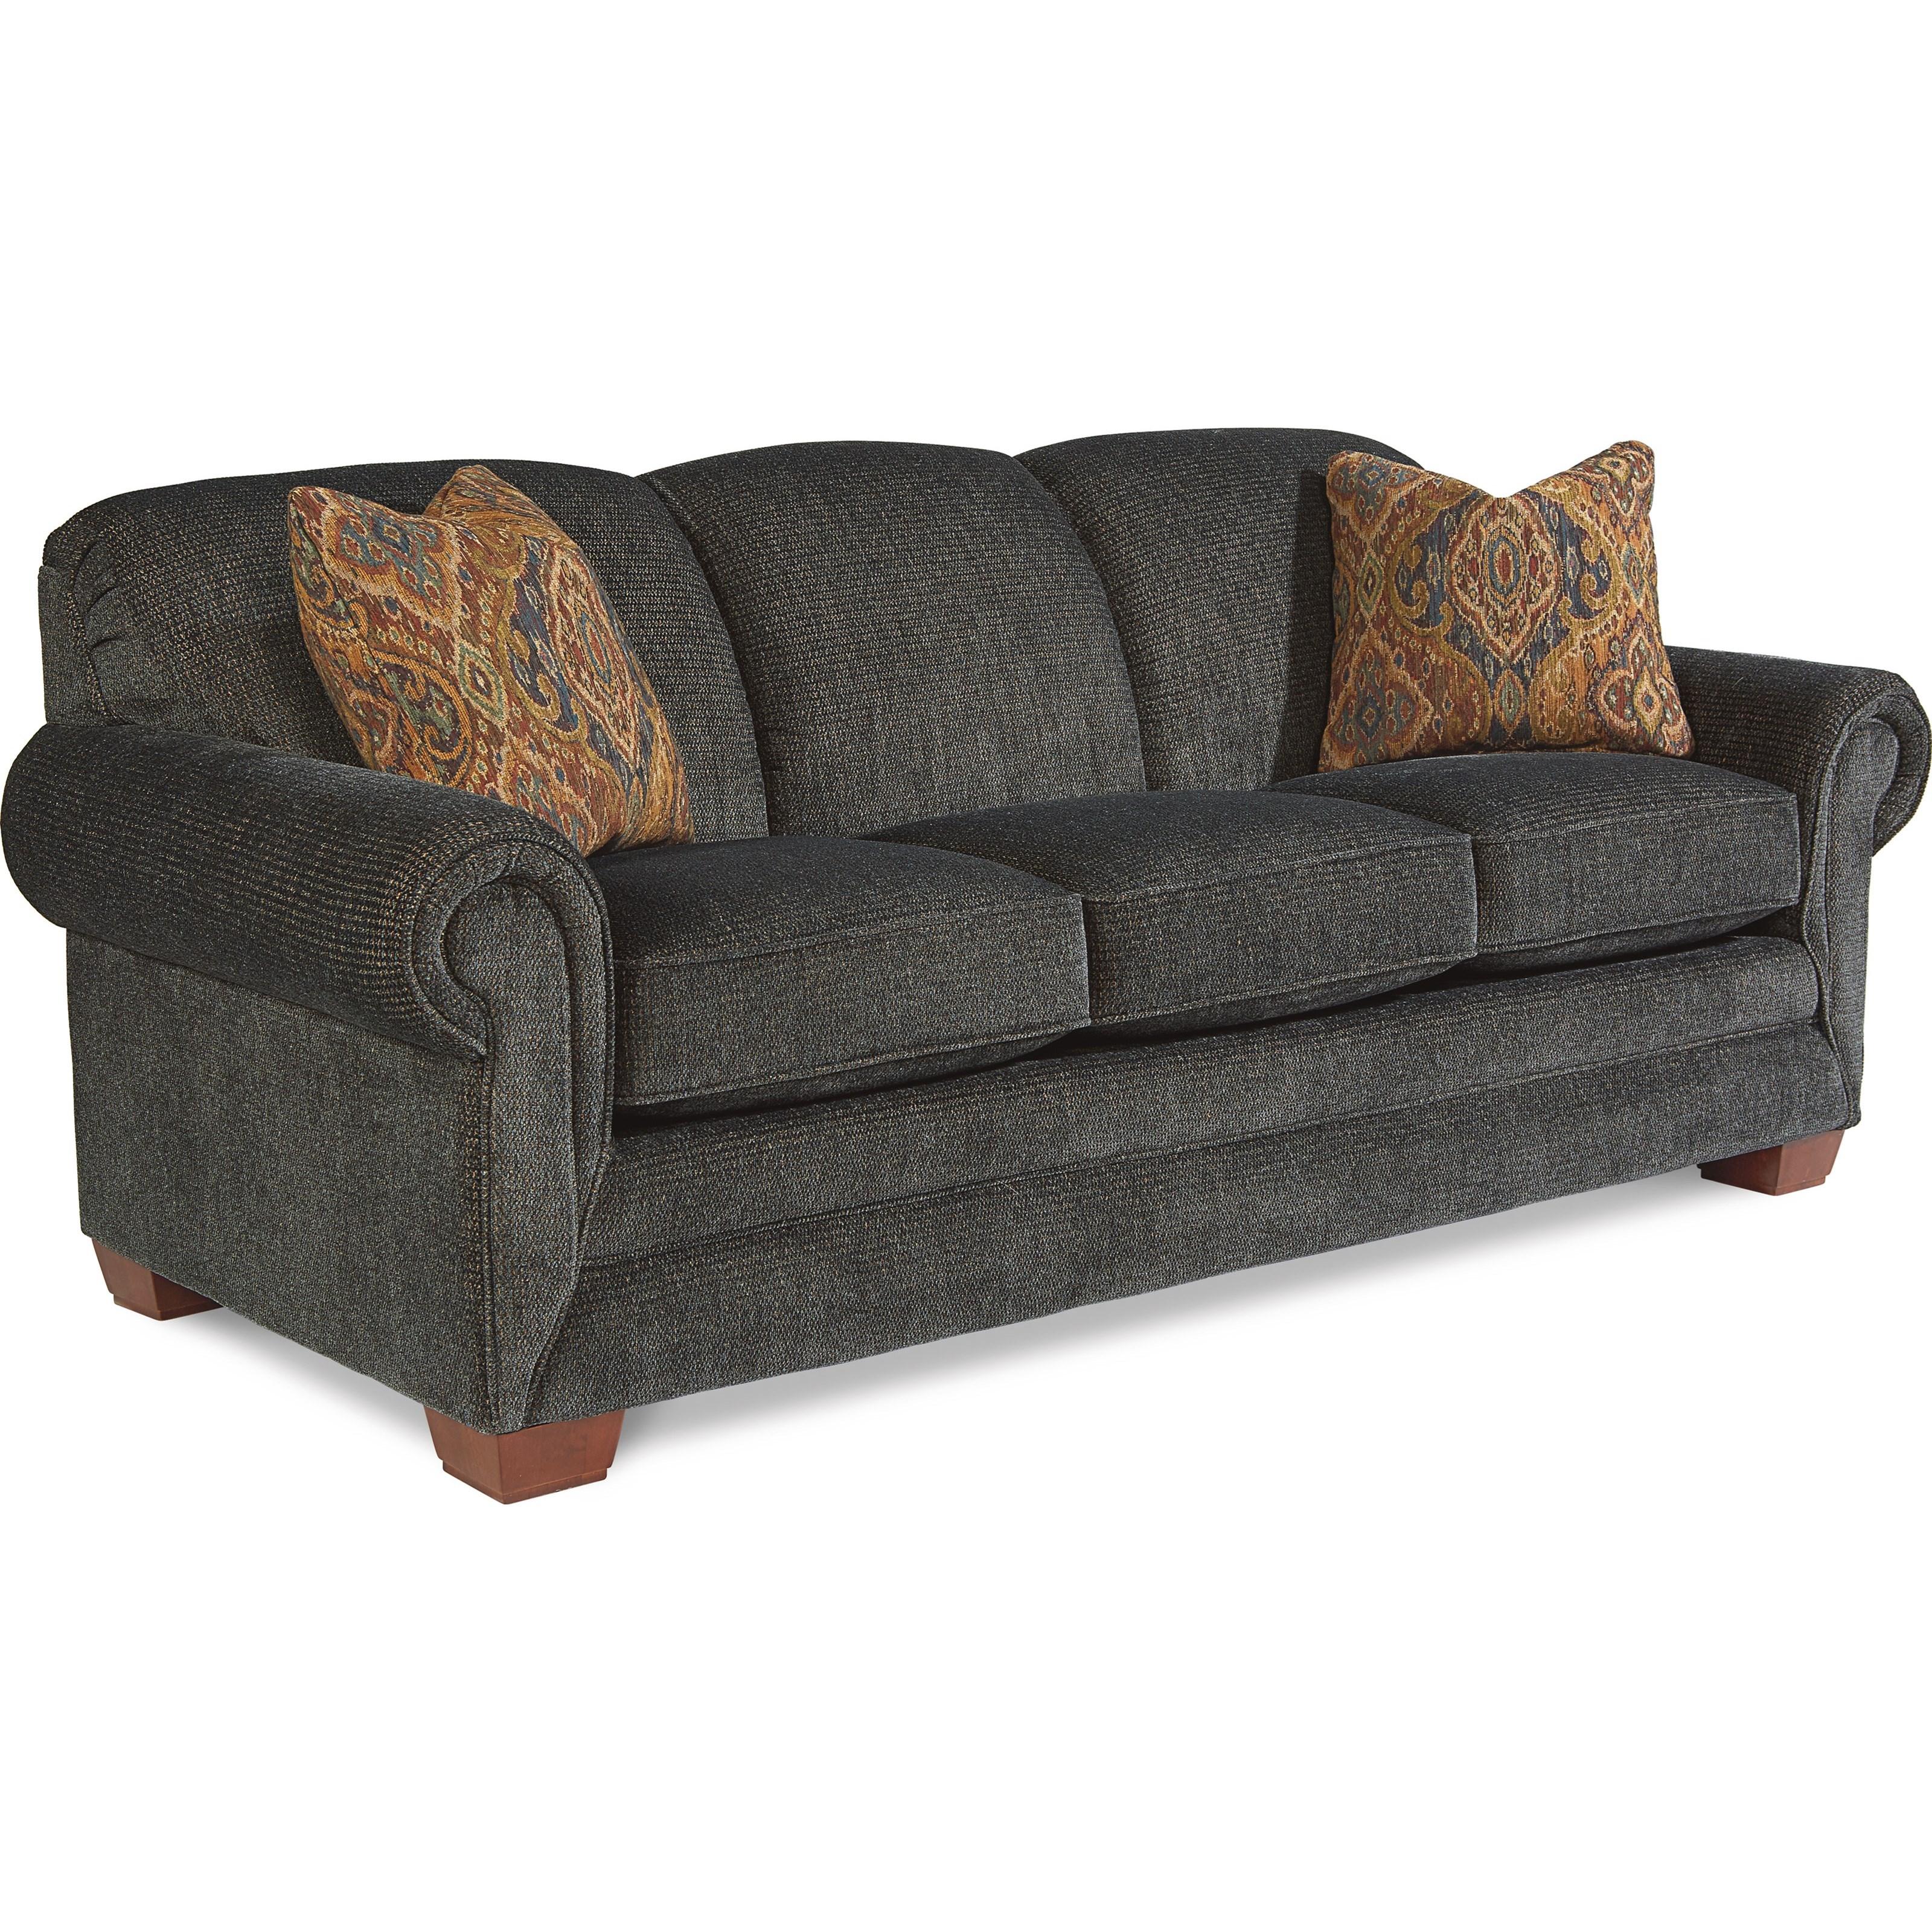 Premier SUPREME FORT™ Queen Sleep Sofa by La Z Boy